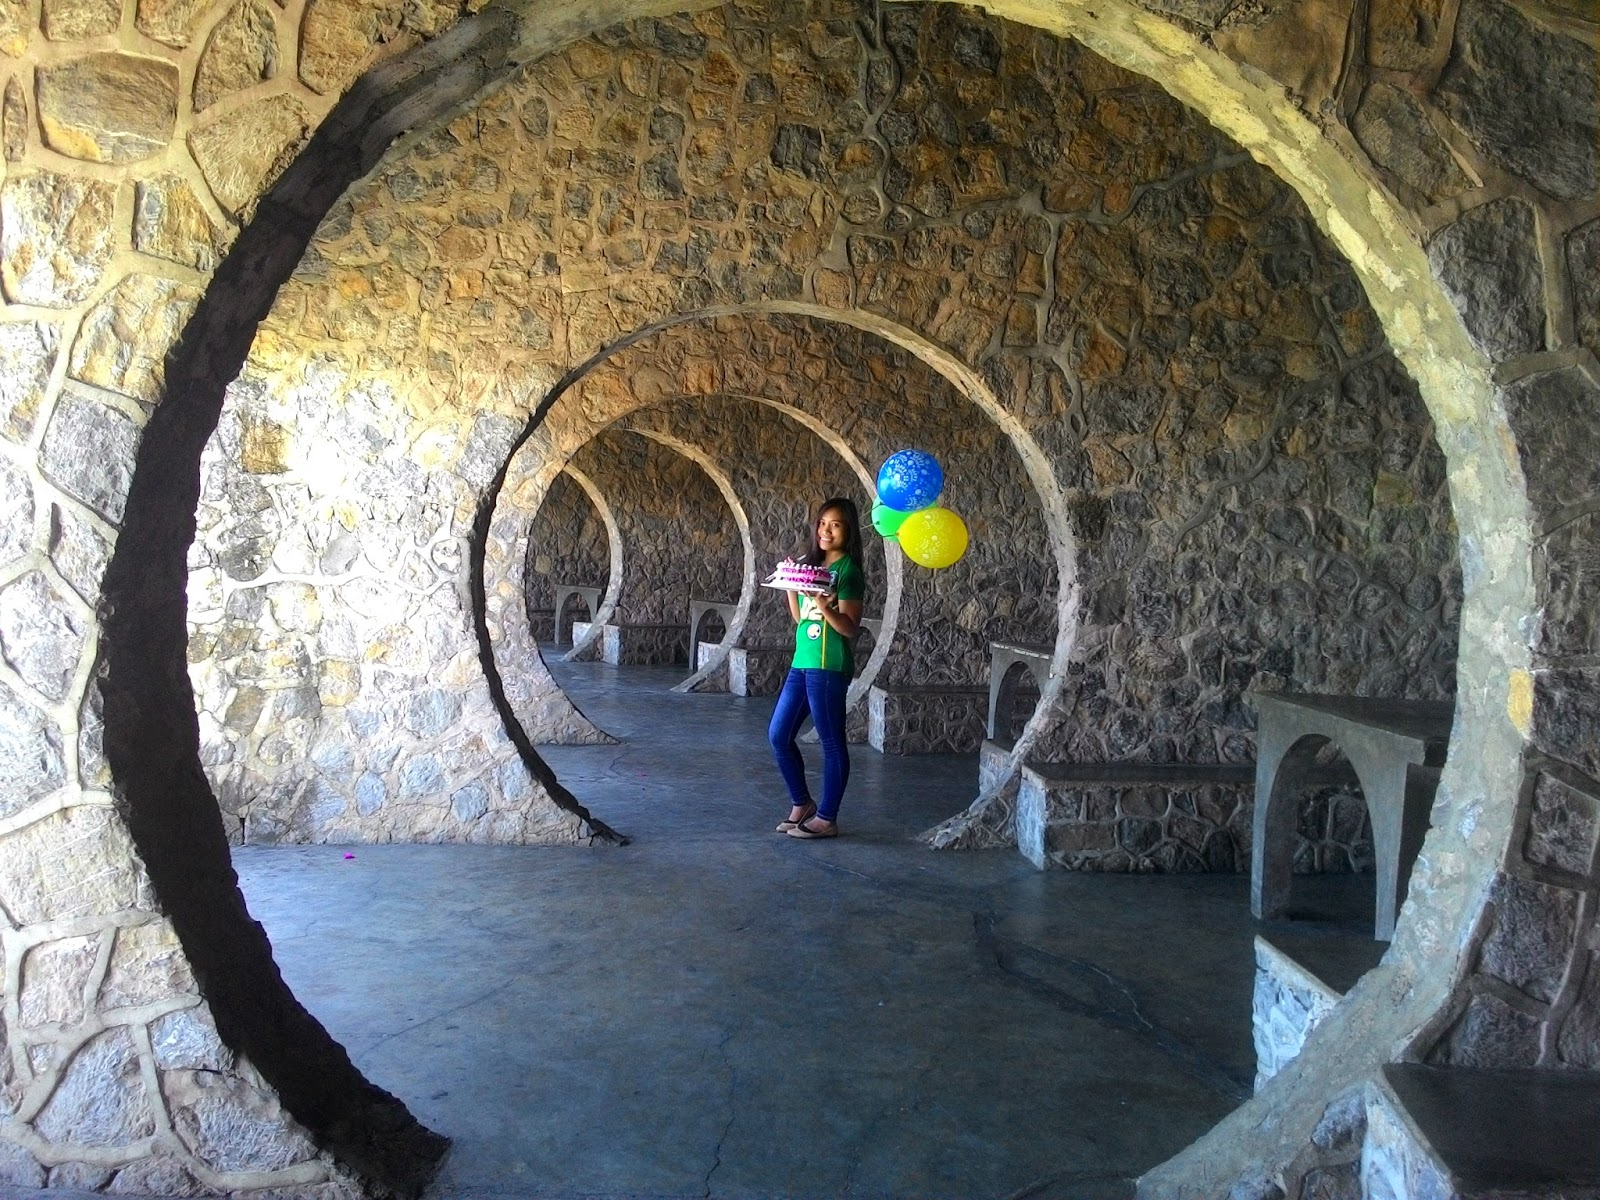 tops lookout cebu almera talks sharing life s little moments